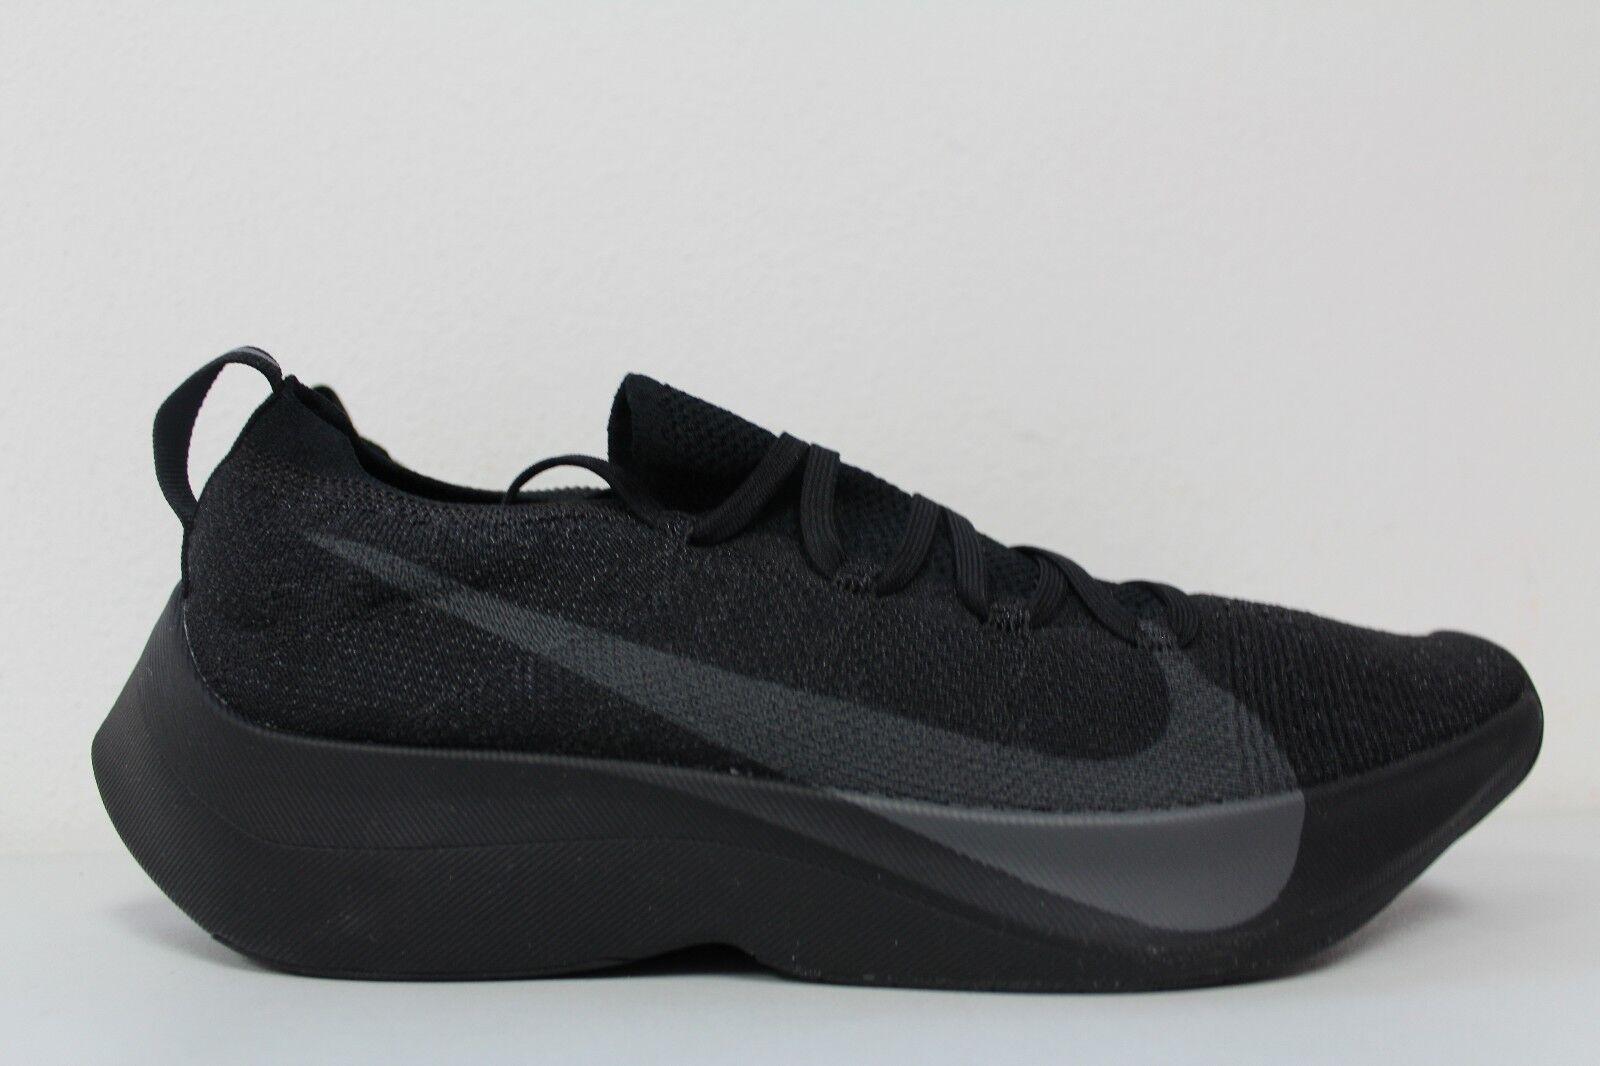 Men's Nike Vapor Street Flyknit Black Anthracite AQ1763-001 Size 10.5